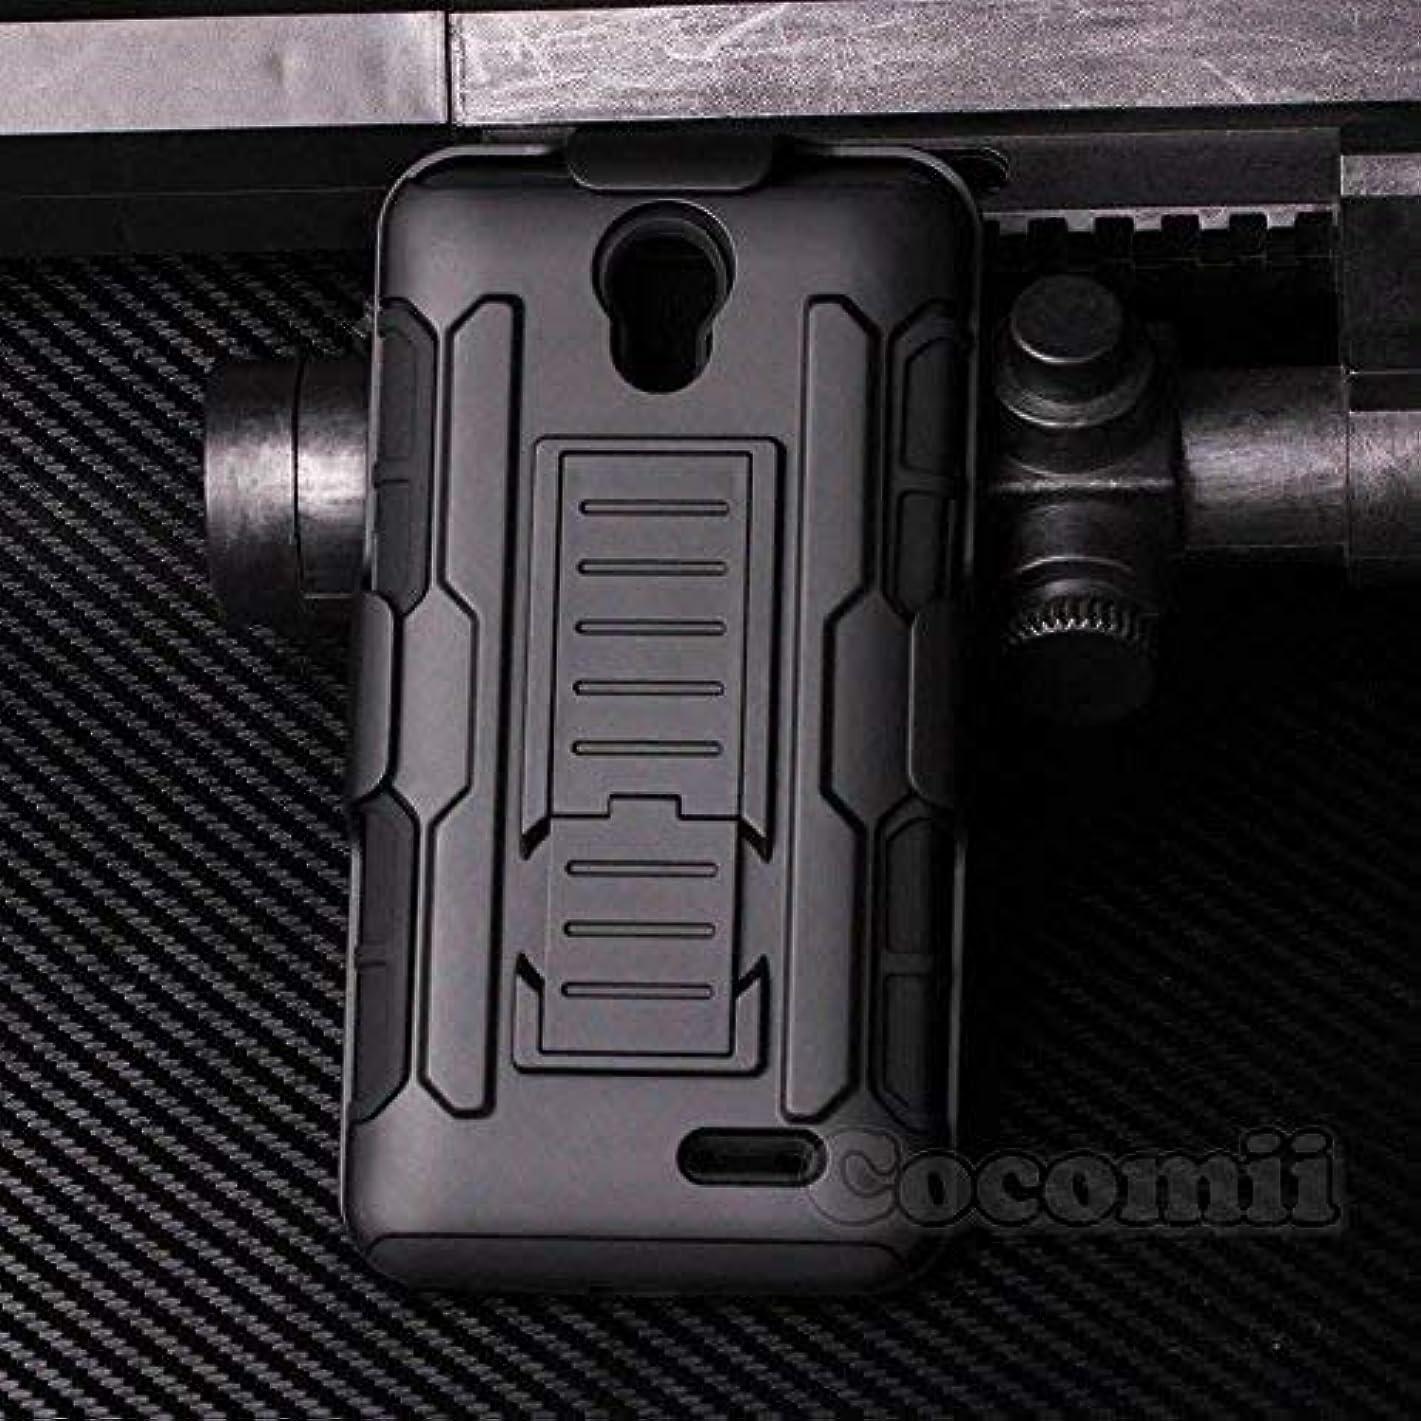 Cocomii Robot Armor ZTE Prestige/Avid Plus/Chapel/Sonata 3/Maven 2 Case New [Heavy Duty] Belt Clip Holster Kickstand Shockproof Bumper [Military Defender] Full Body Cover for ZTE Prestige (R.Black)